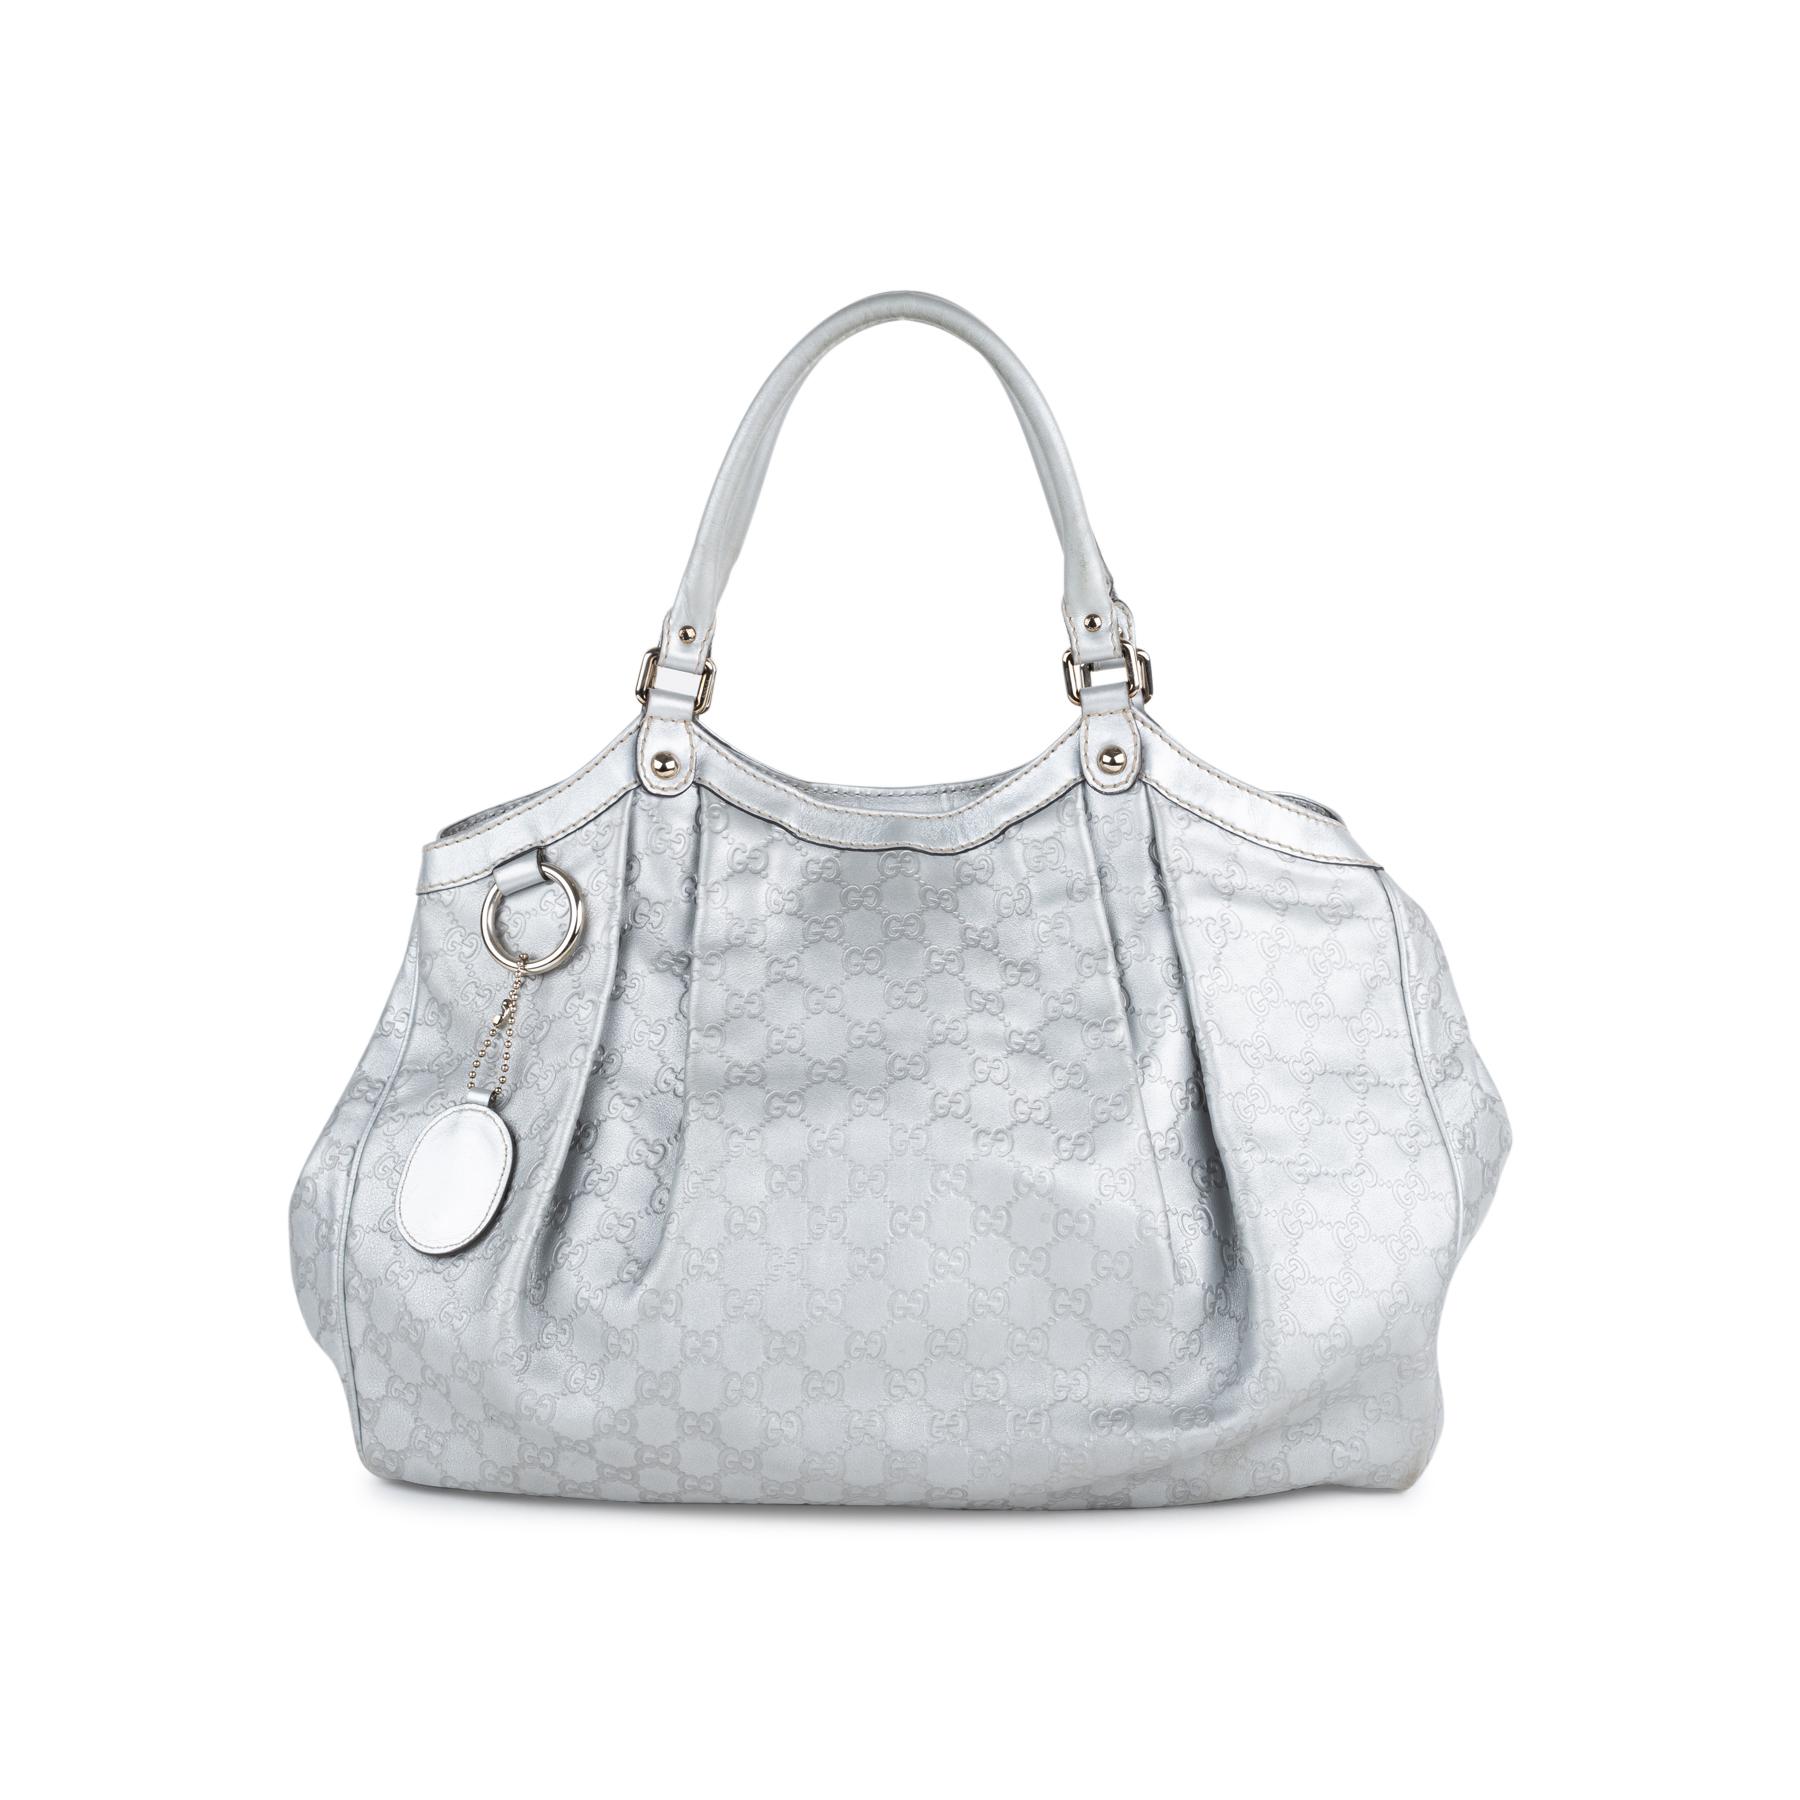 c605ec012e2b Authentic Second Hand Gucci Sukey Guccissima Tote Bag (PSS-552-00024) | THE  FIFTH COLLECTION